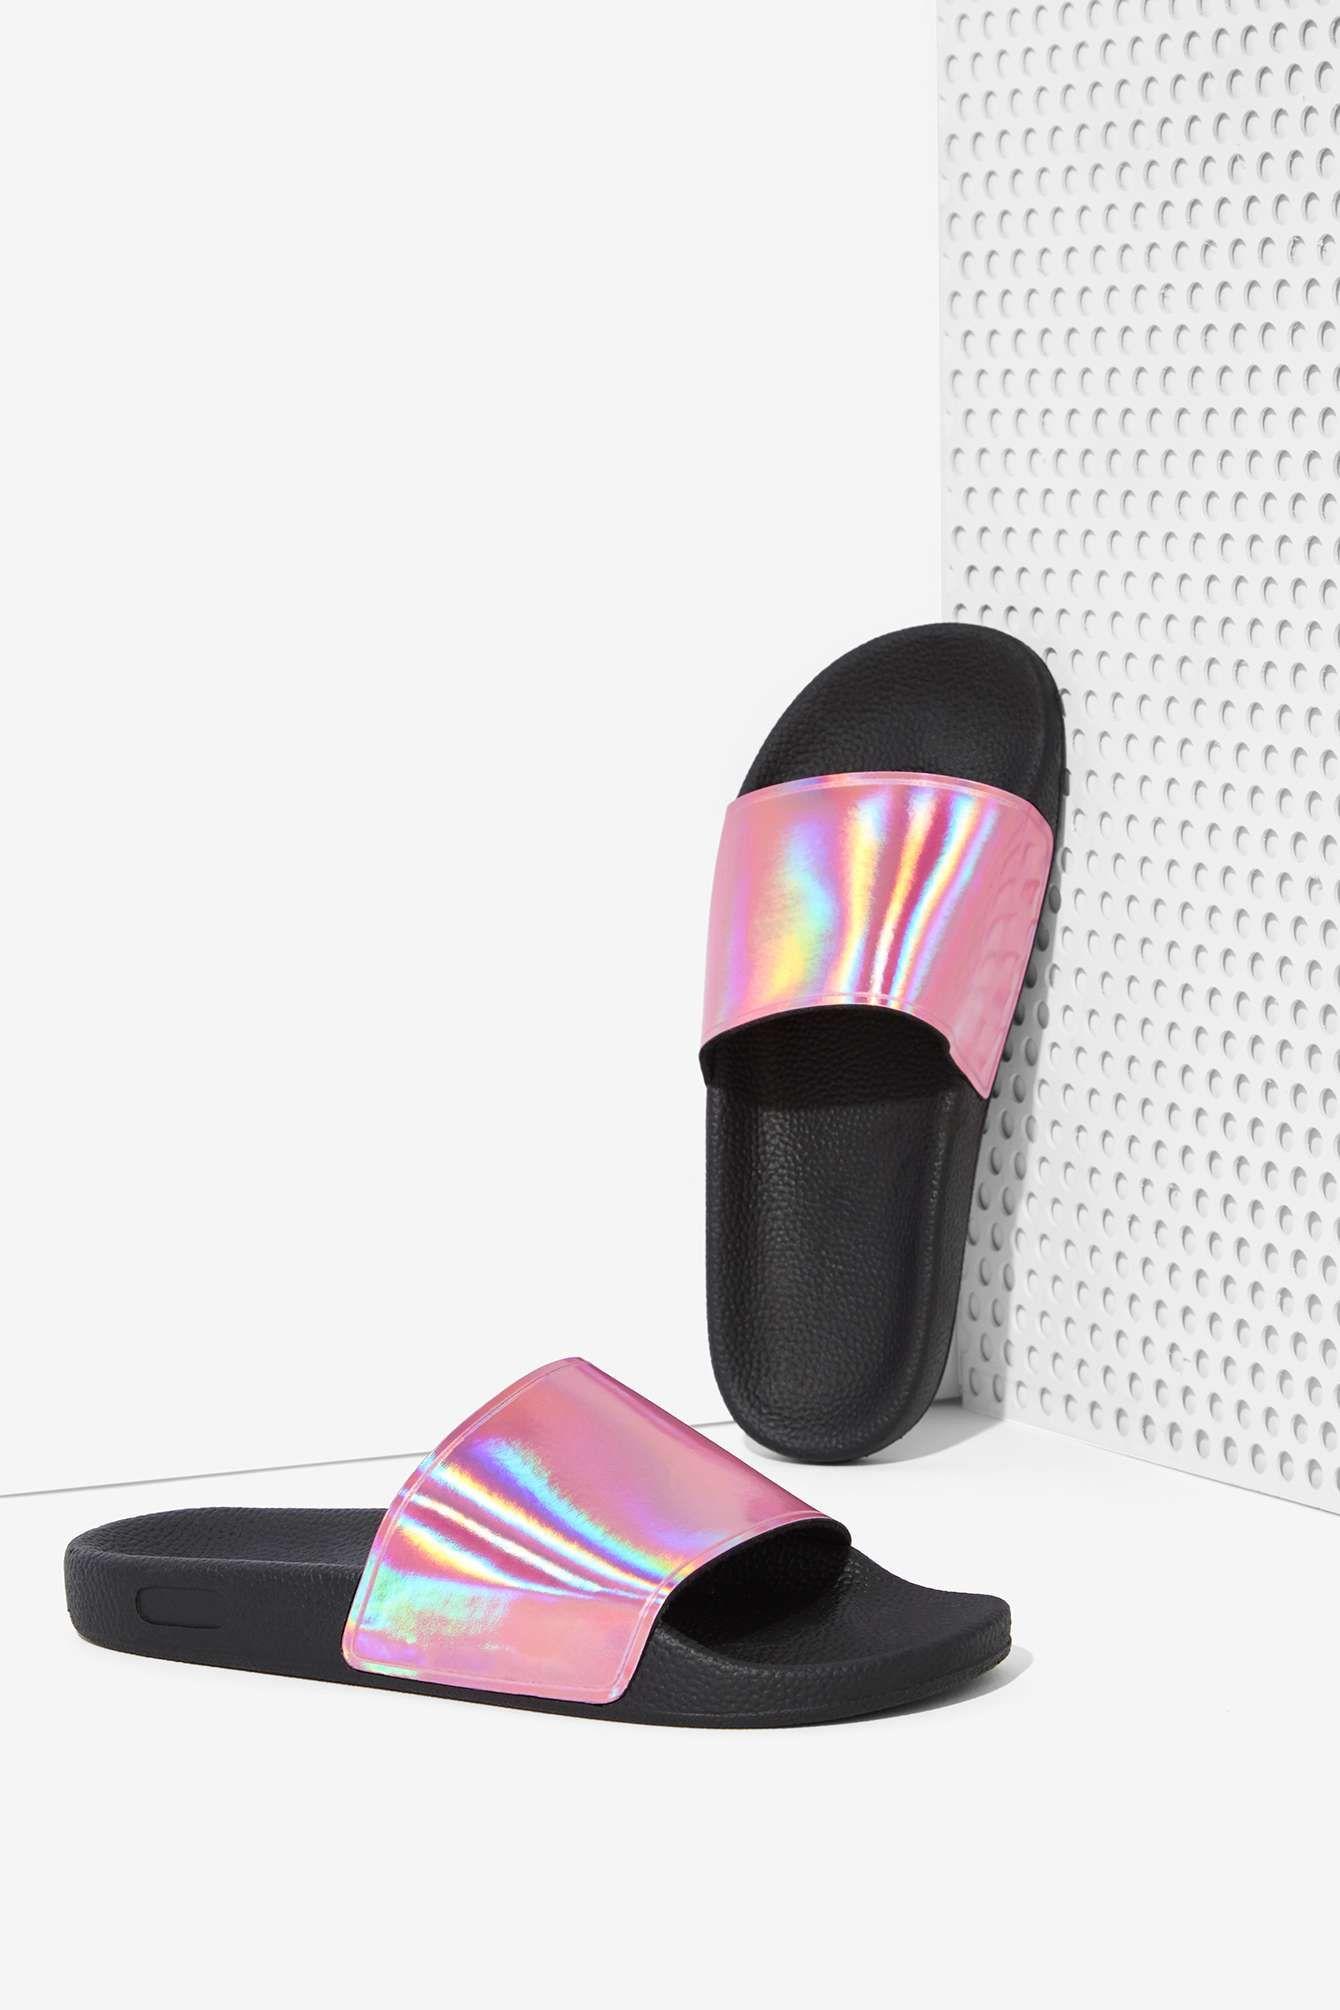 Sixty Seven Ariel Slides Pink Hologram Womens sandals